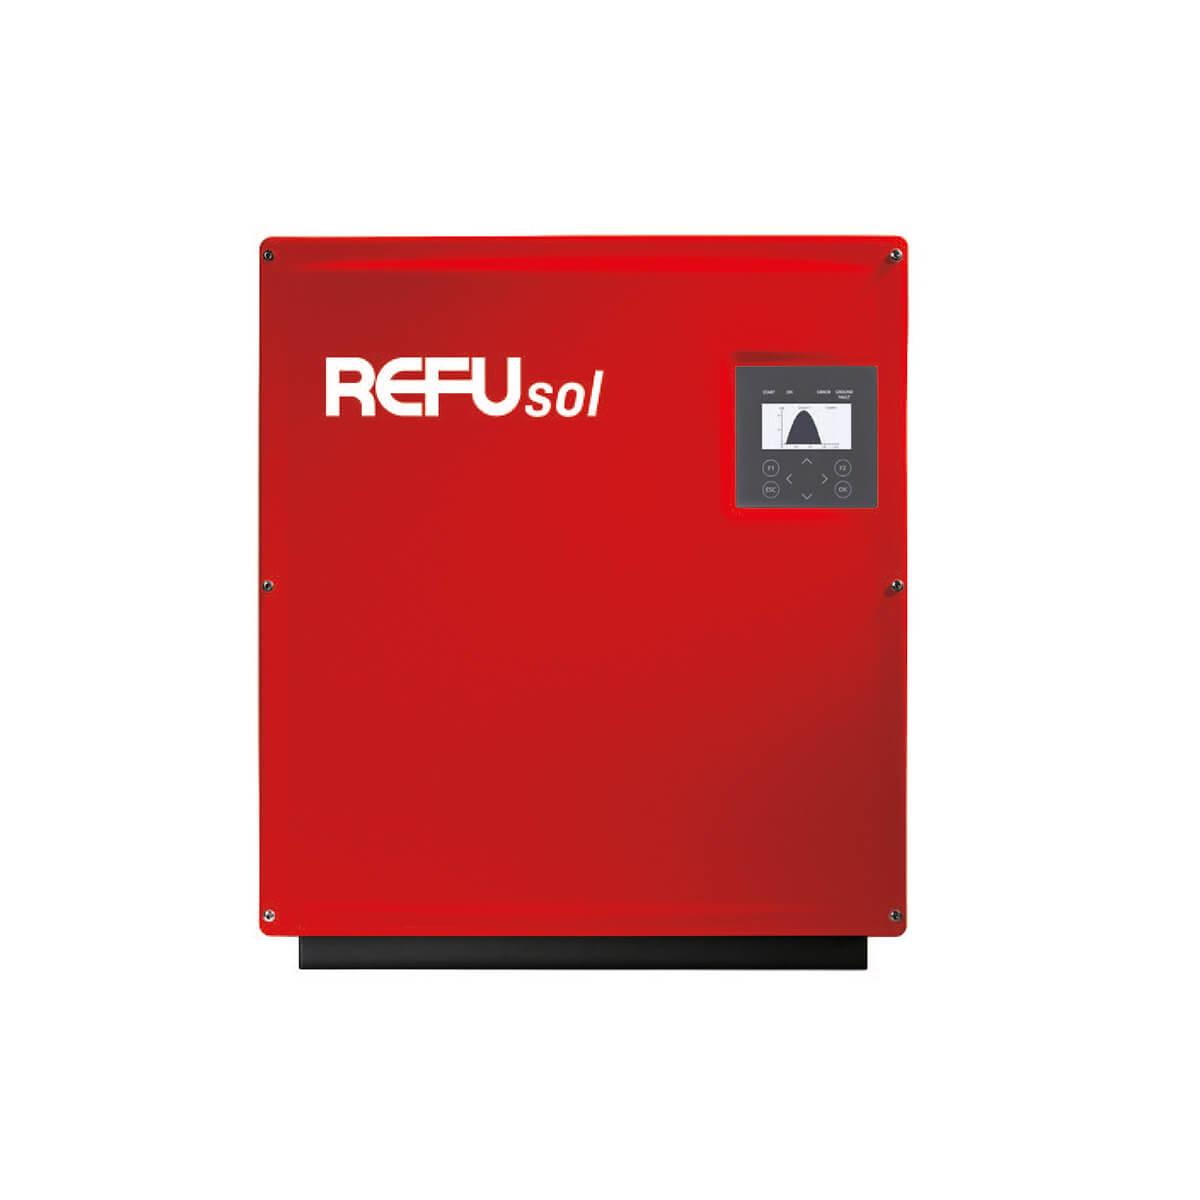 refusol 17kW inverter, refusol 17k 17kW inverter, refusol 17k inverter, refusol 17k, refusol 17k 17 kW, REFUSOL 17 KW